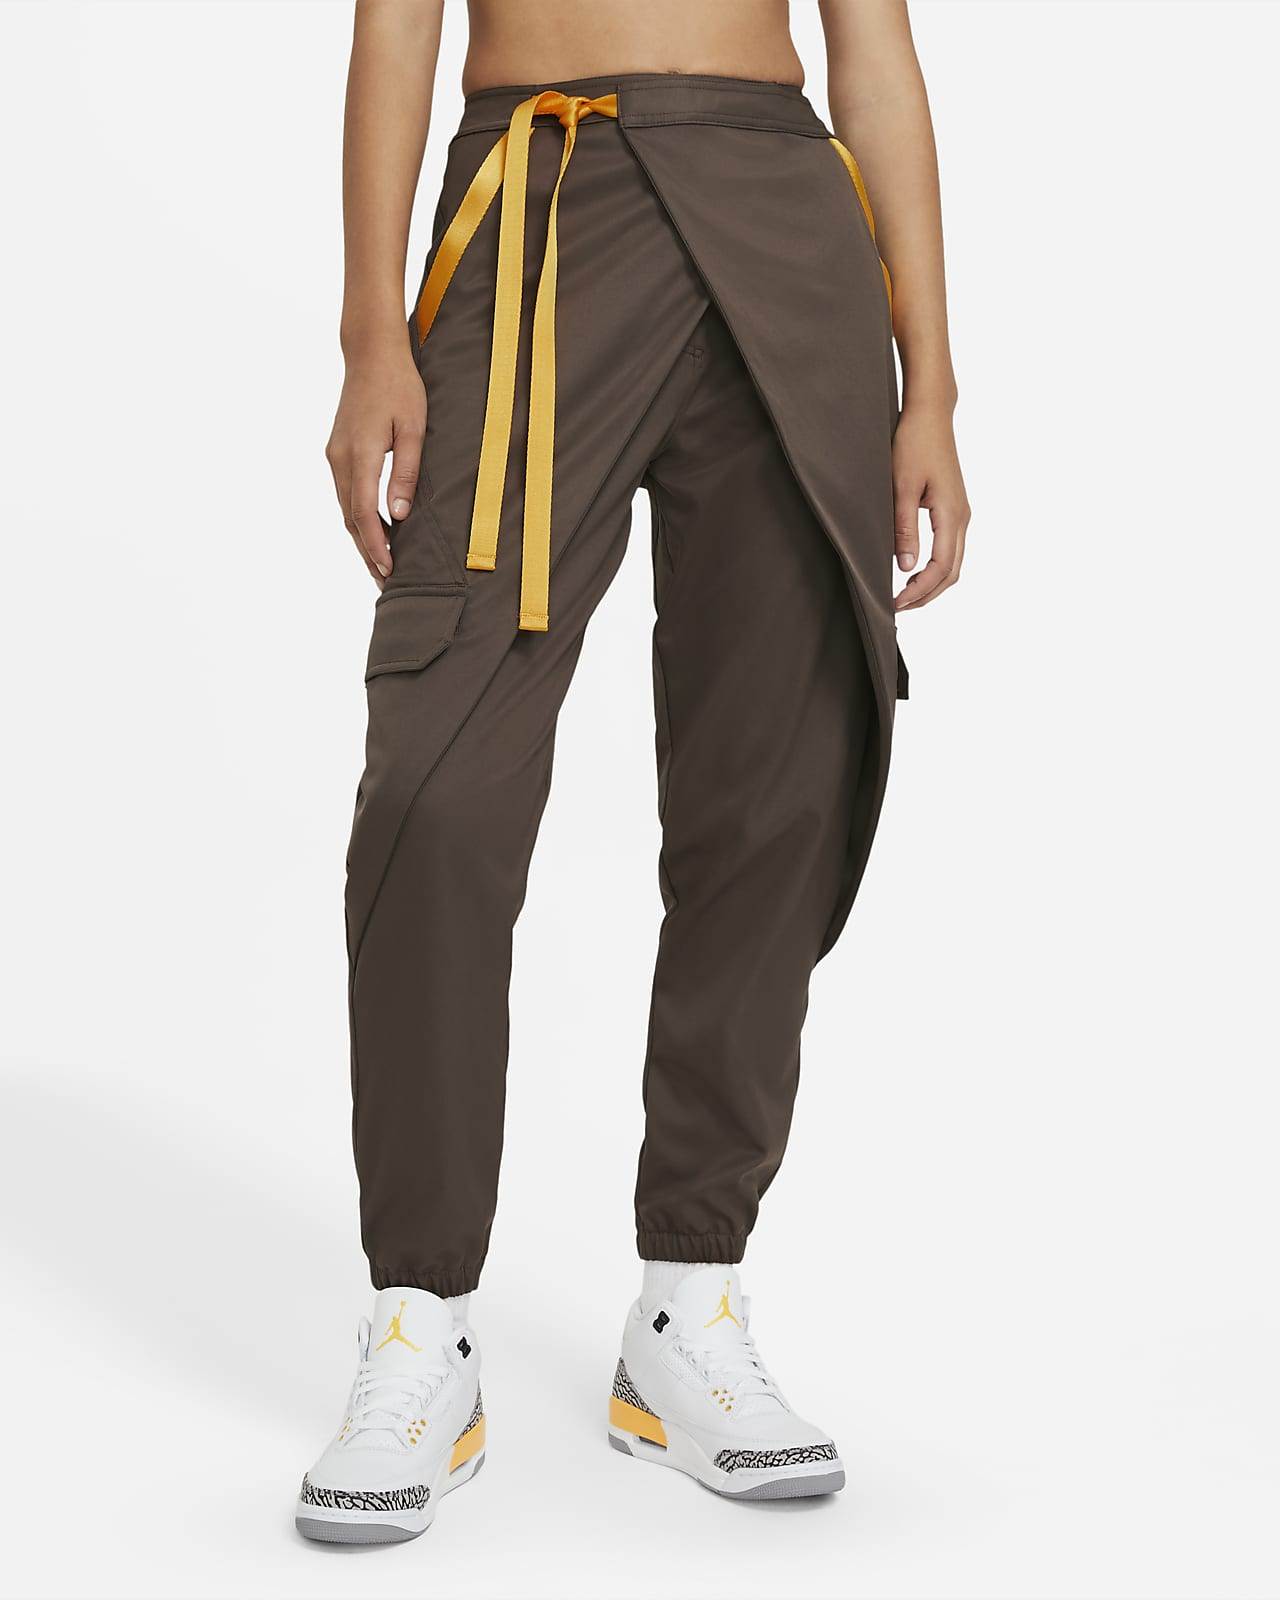 Jordan Future Primal Women's Utility Trousers